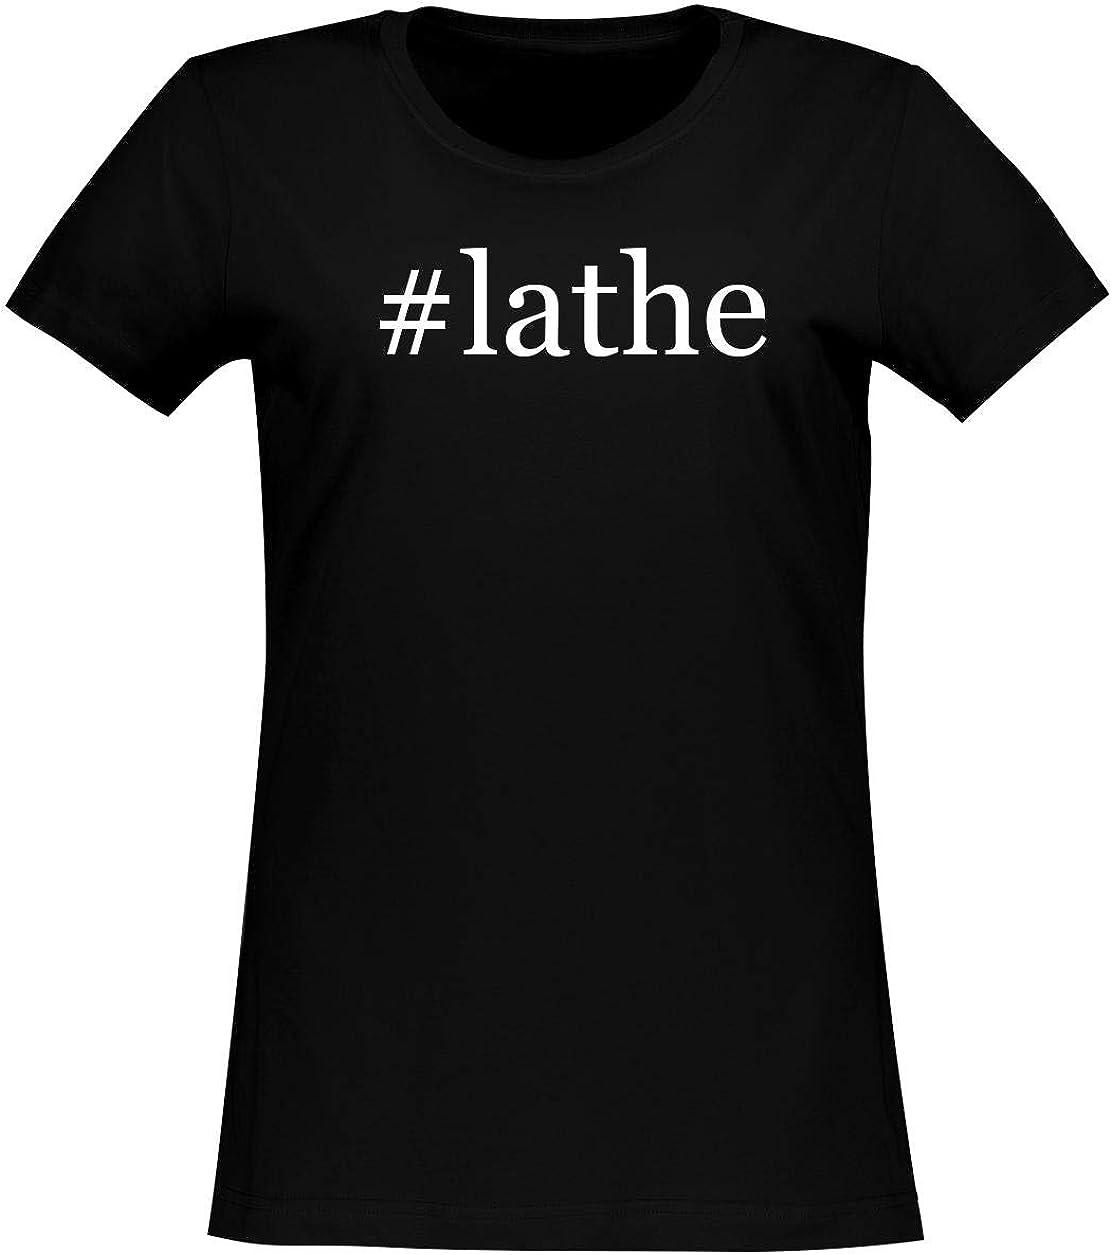 #lathe - Women's Soft & Comfortable Hashtag Junior Cut T-Shirt